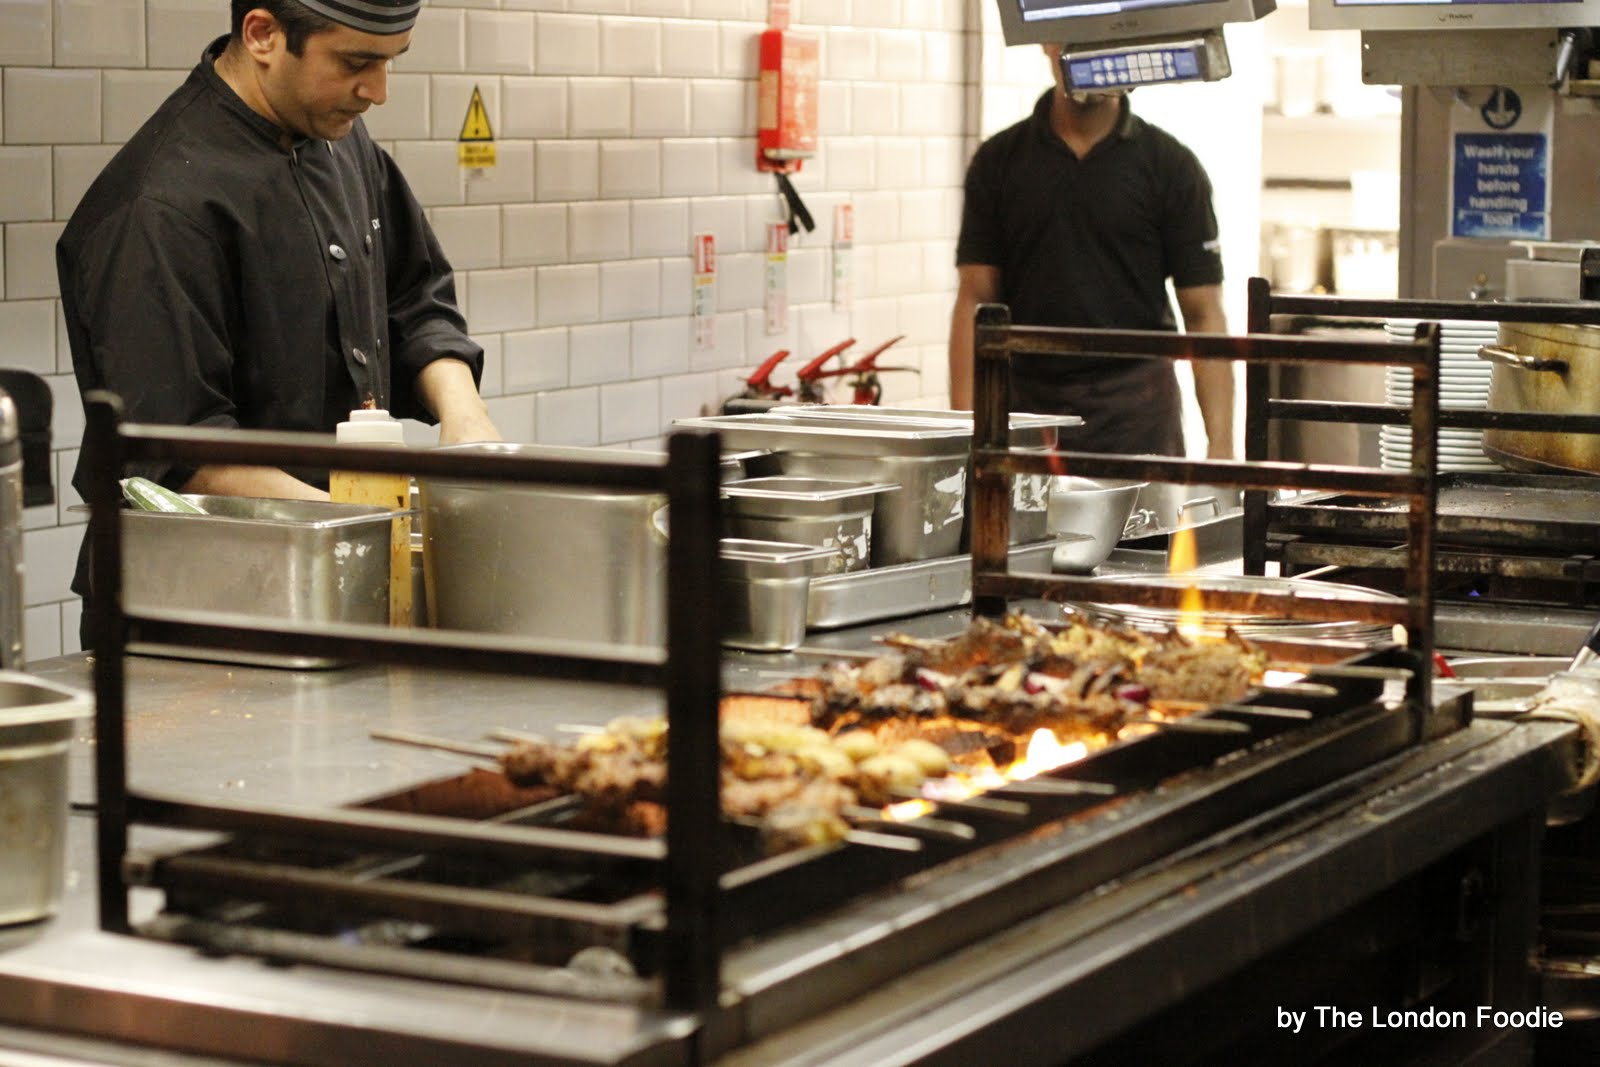 Kitchen Shutters Engineered Wood Flooring The London Foodie: Restaurant Reviews - Dishoom ...